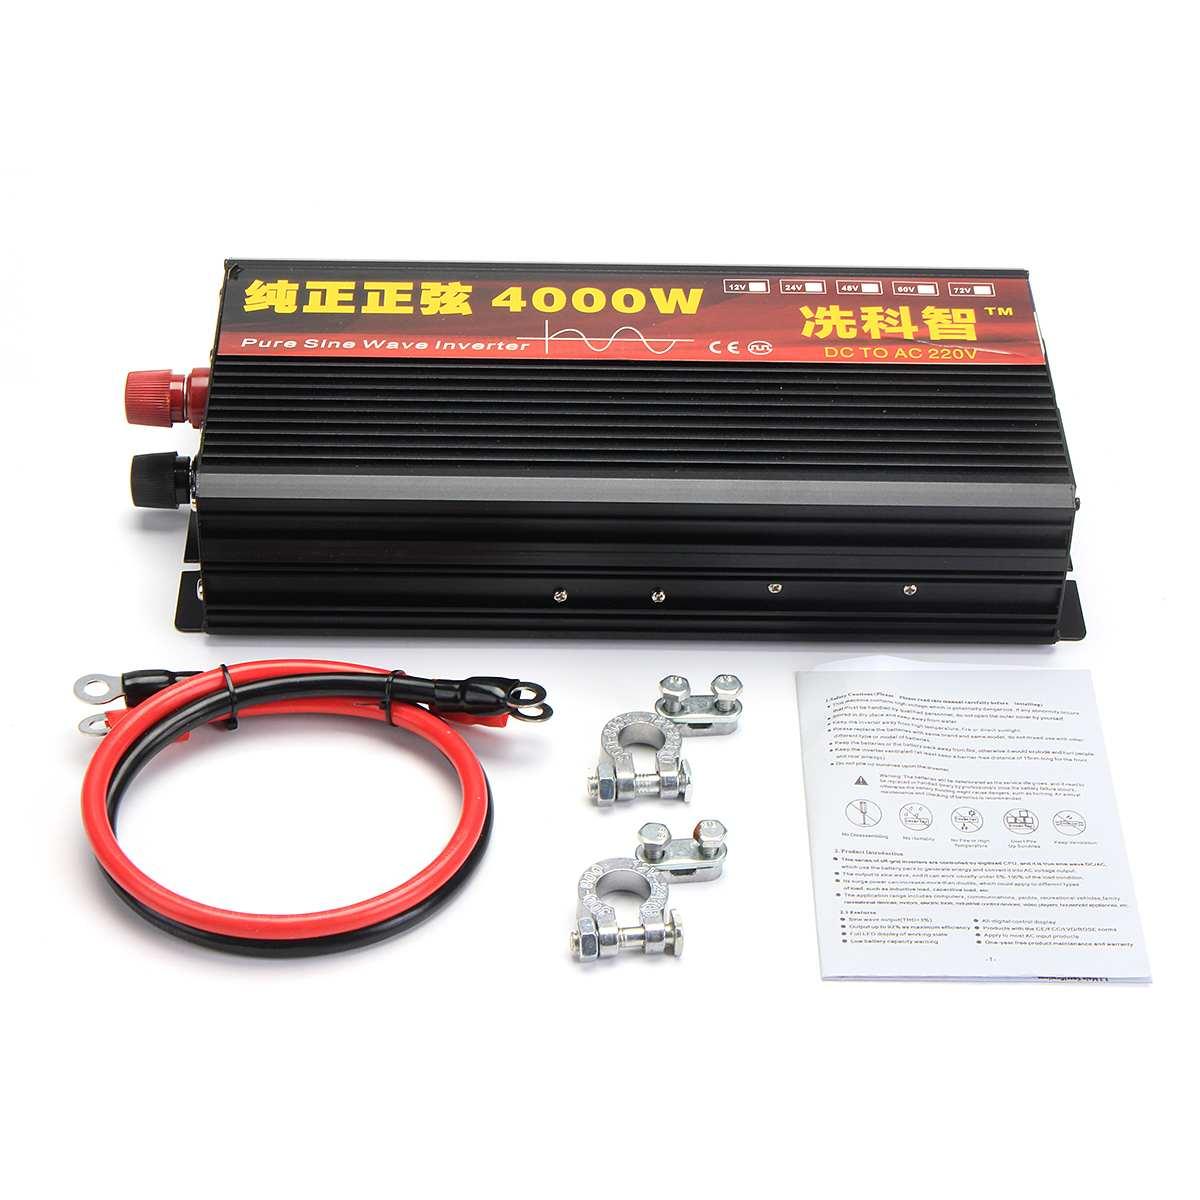 Onduleur 12 V/24 V 220V 2000/3000/4000W transformateur de tension pur onduleur à onde sinusoïdale DC12V à AC 220V convertisseur + 2 LED affichage - 5